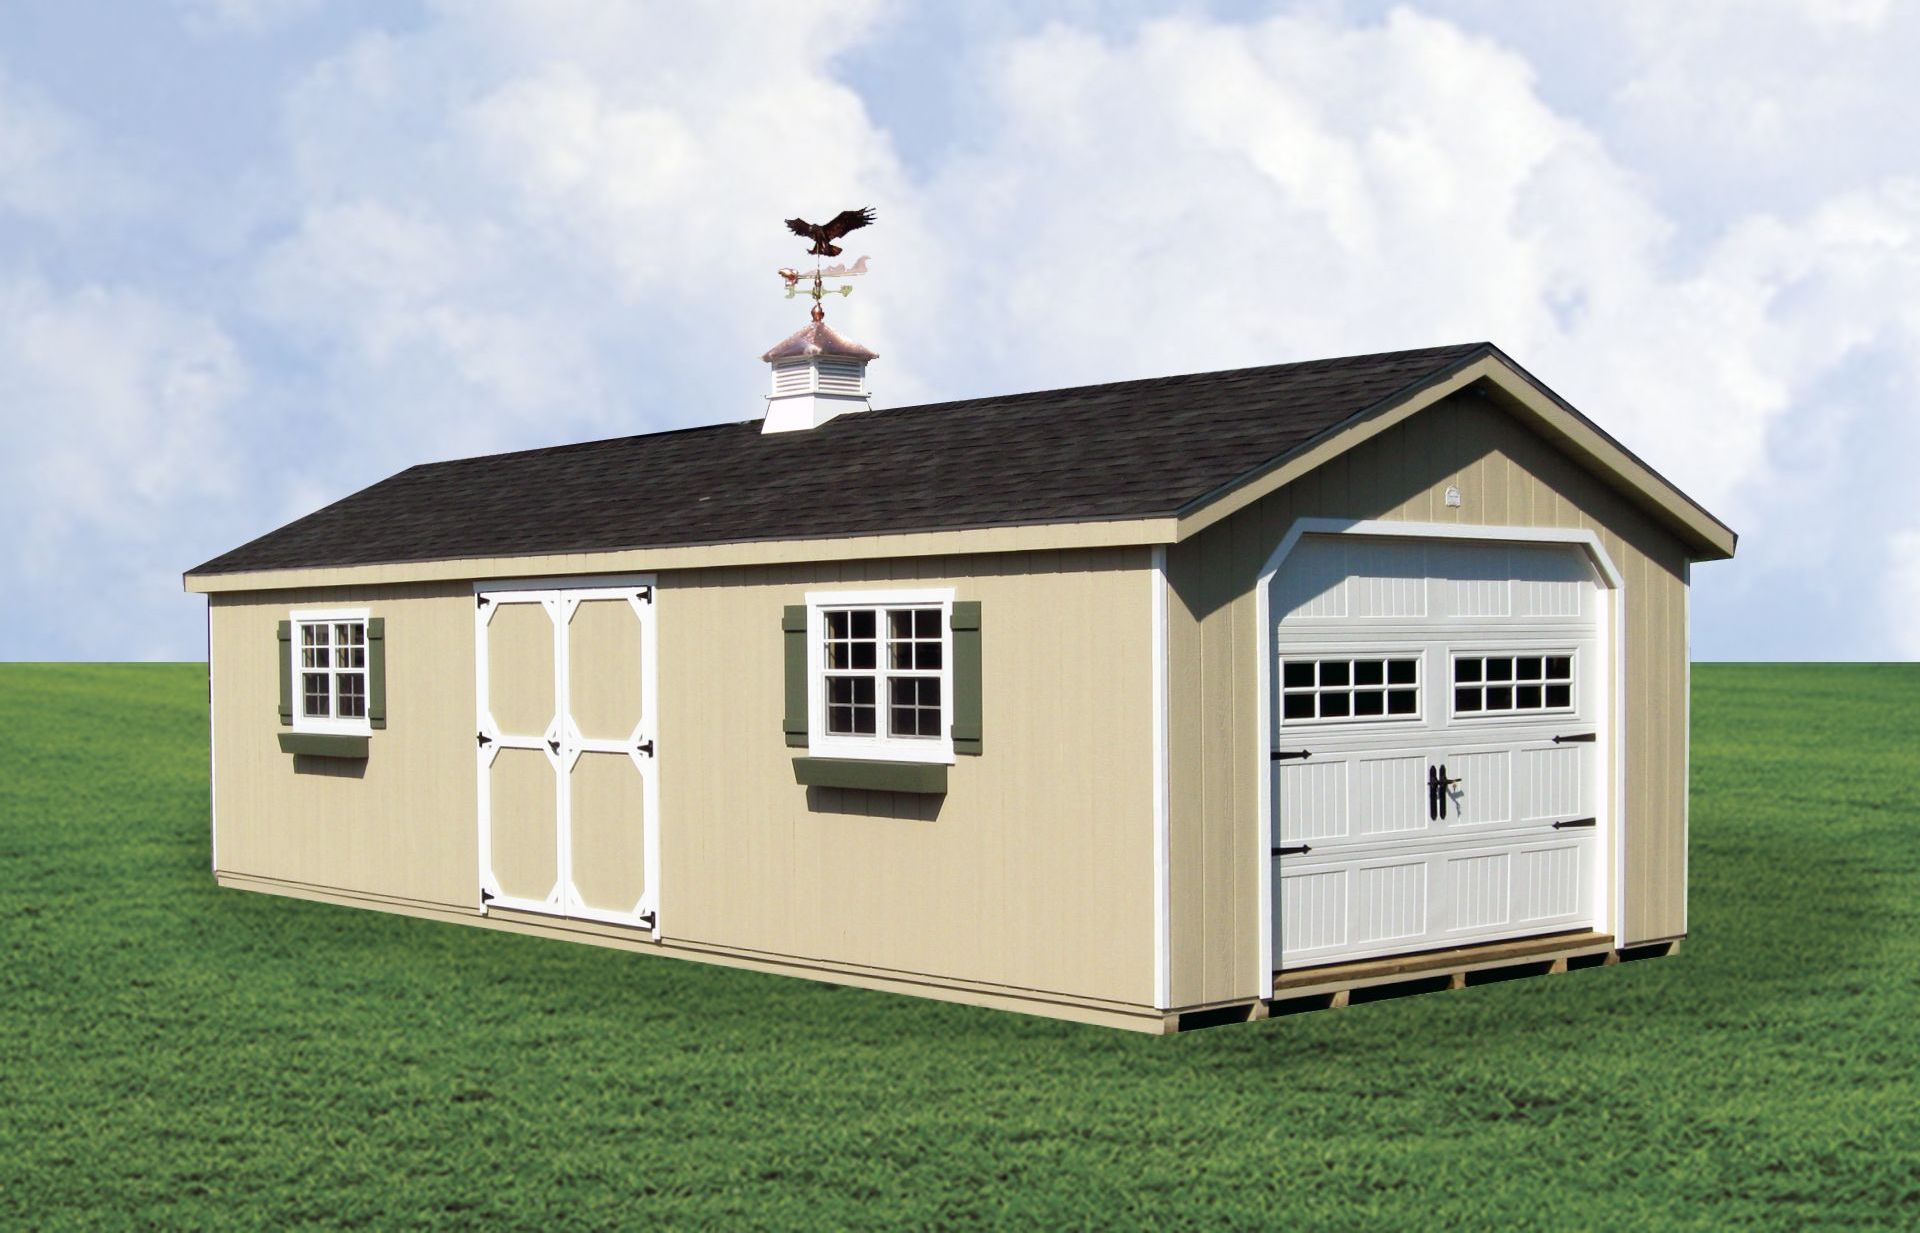 Custom storage garage in Long Island, NY.